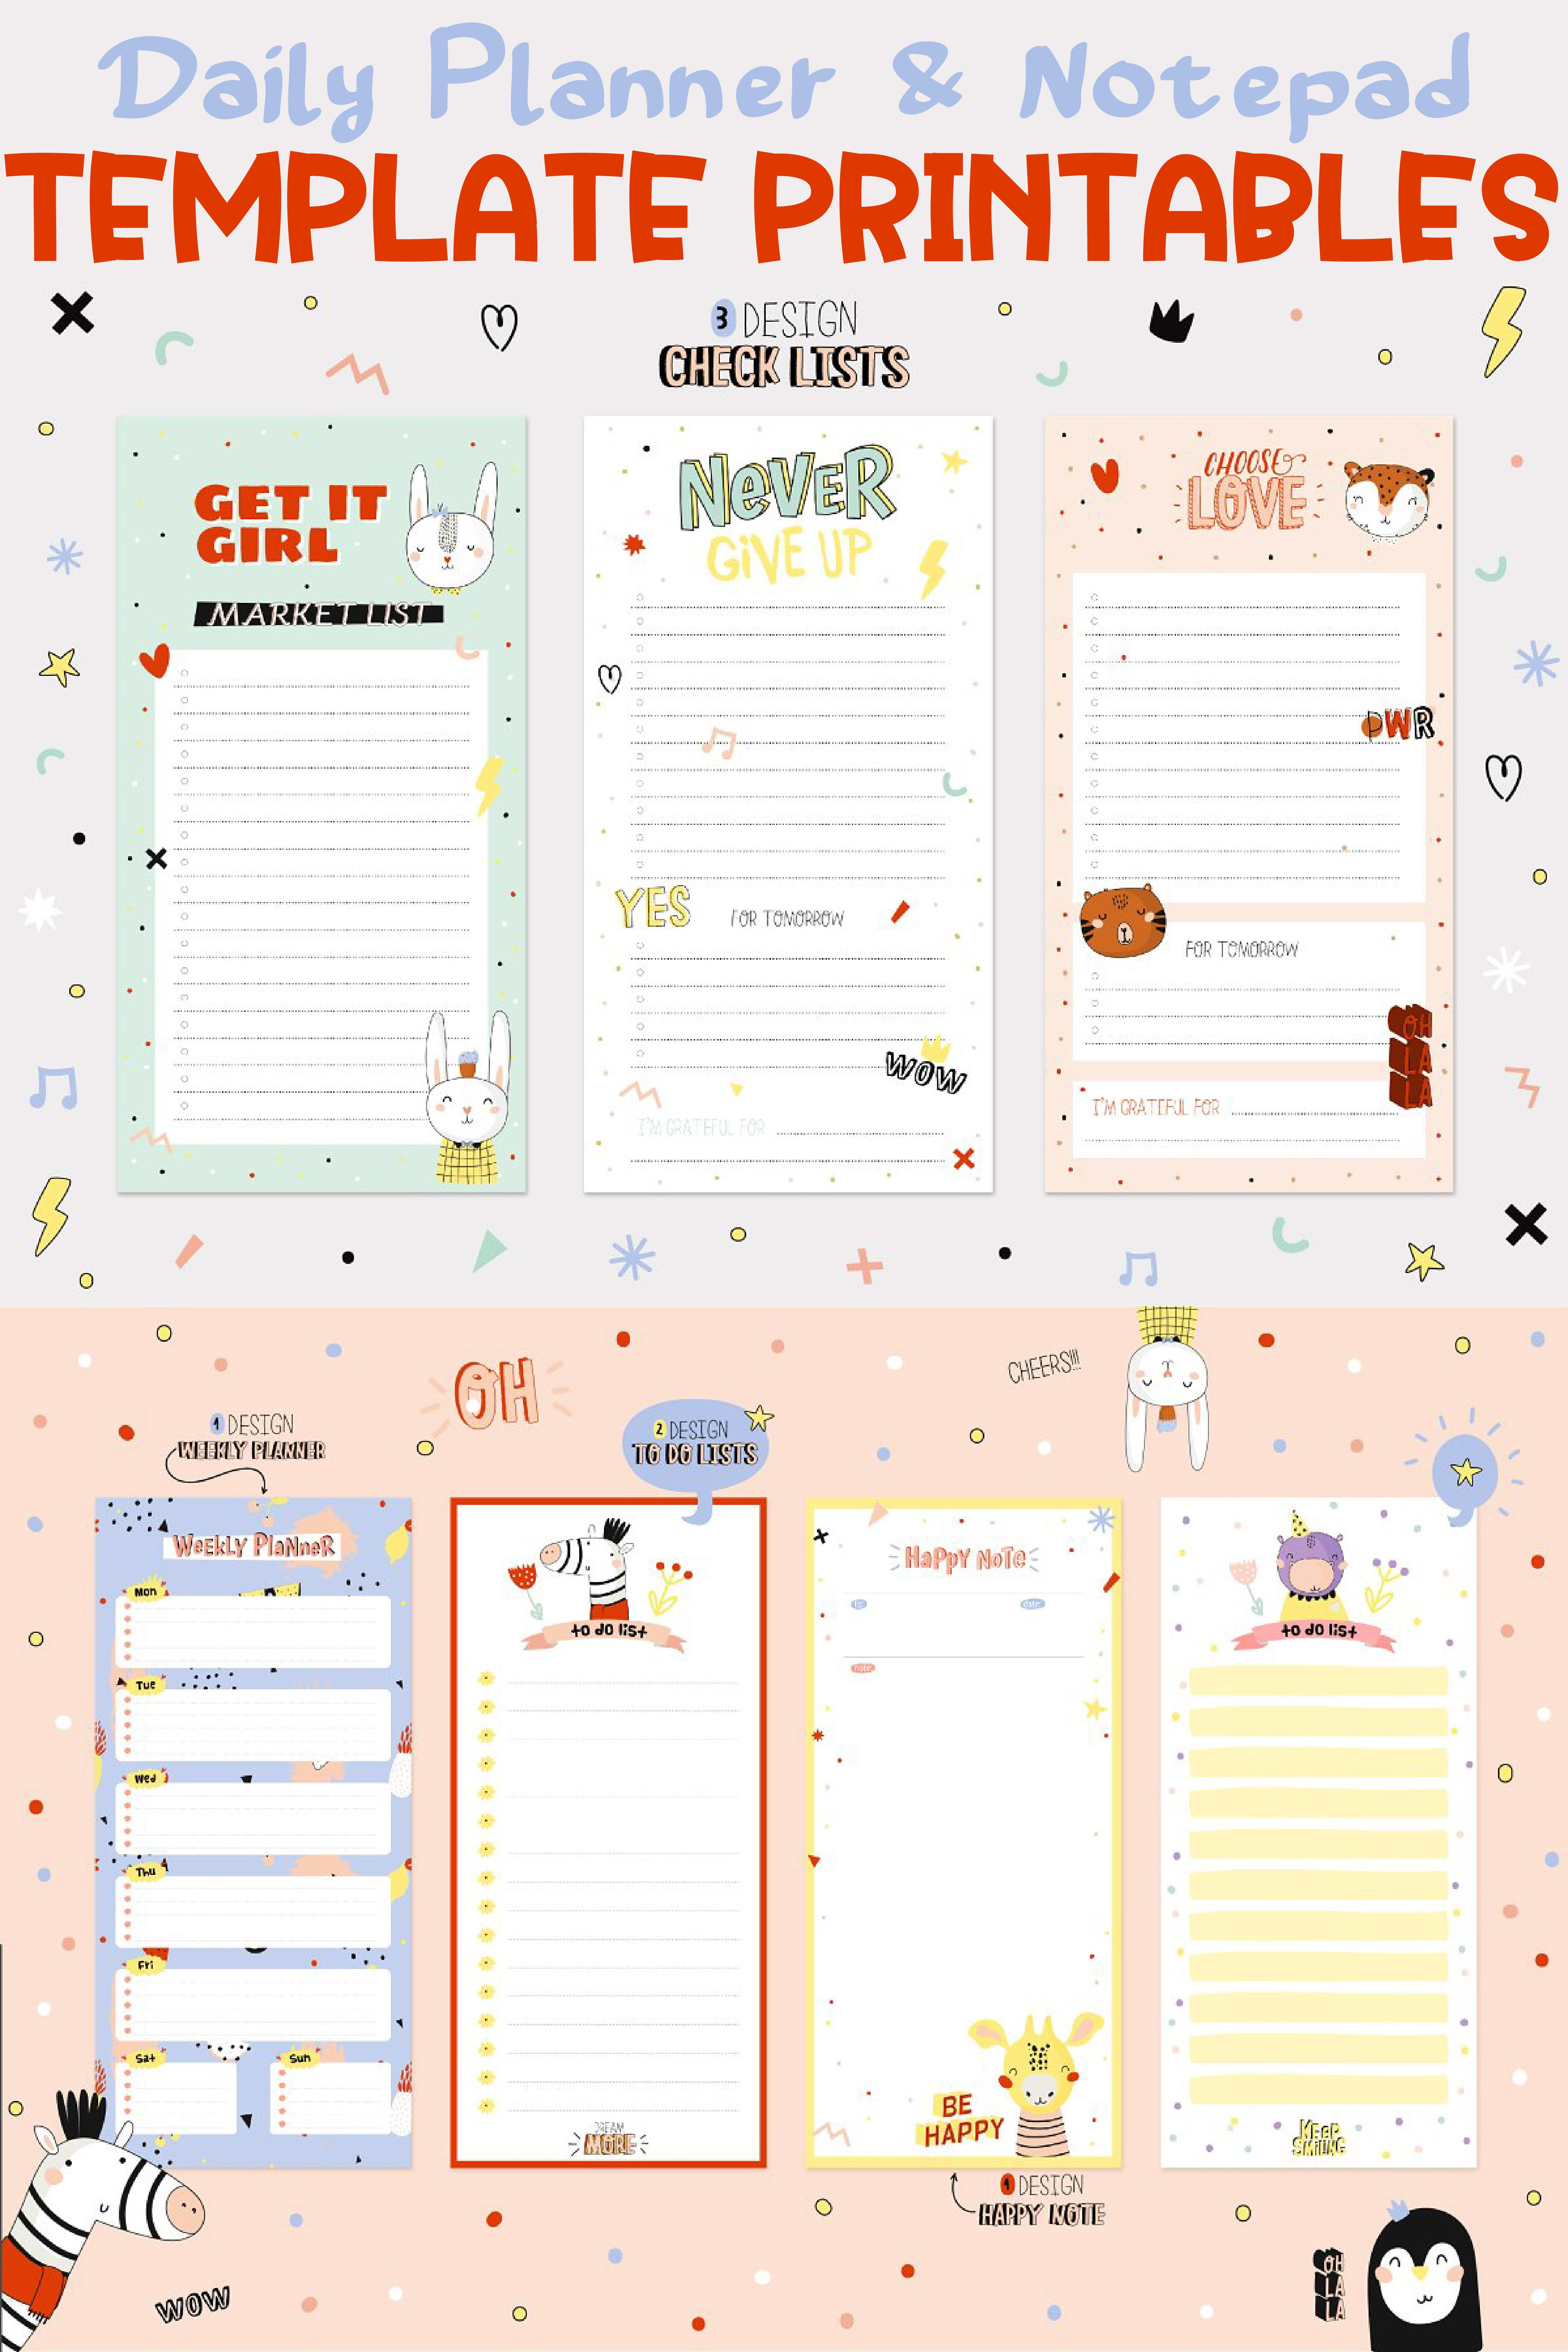 Agenda Planner Printables Free Printable Planner Pages Daily Planner Printable